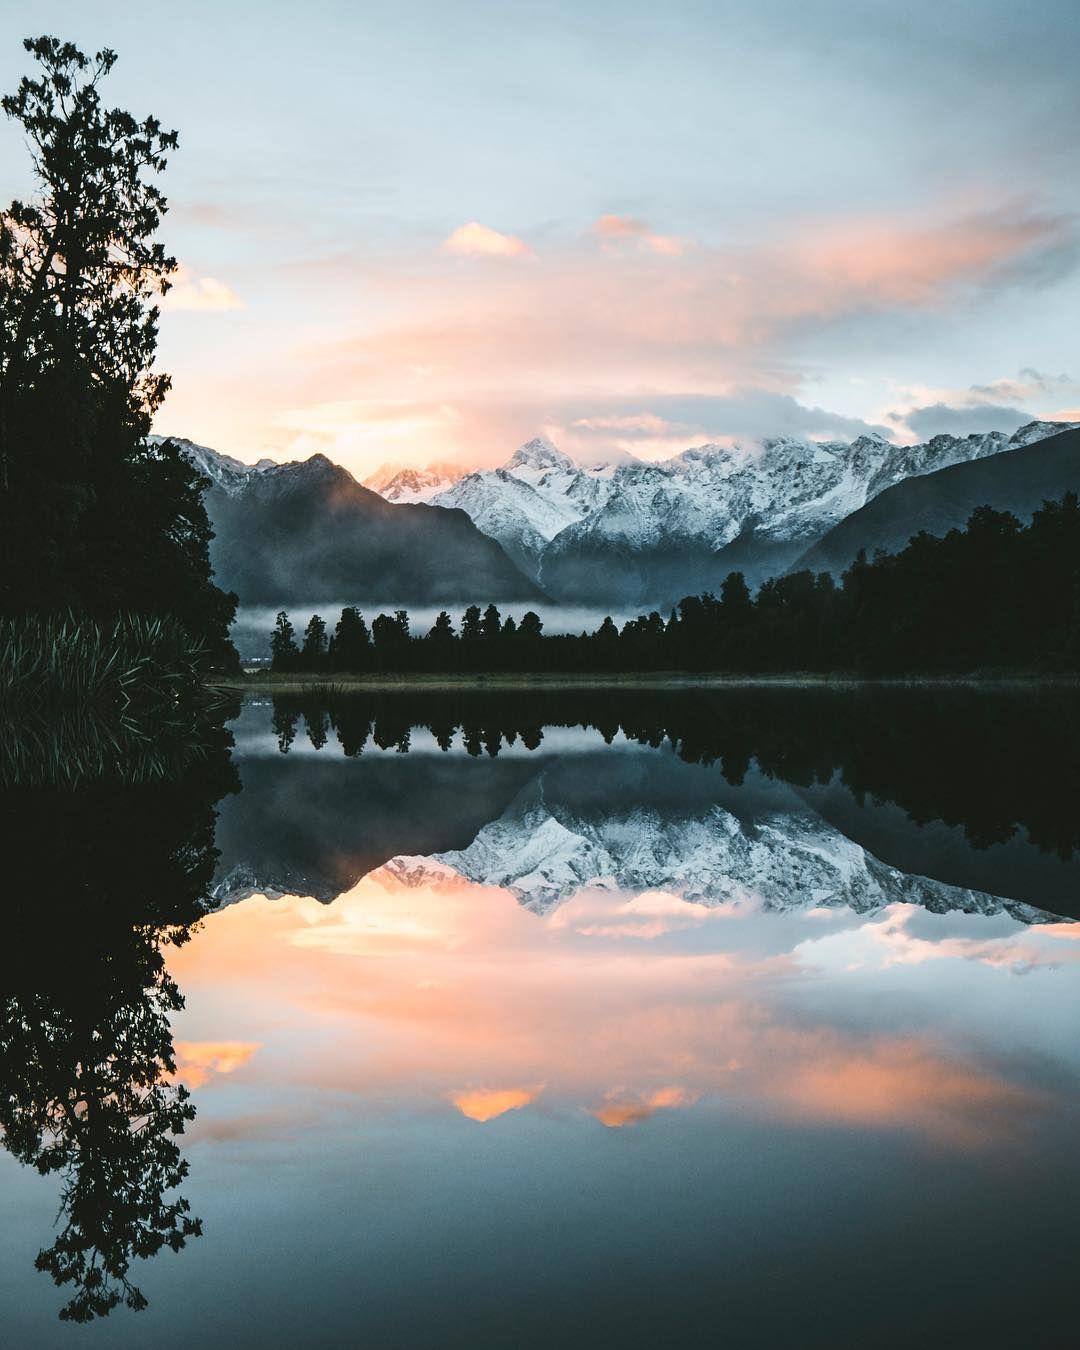 Gorgeous Travel Landscape Photography By Kai Grossmann Mountain Landscape Photography Landscape Photography Landscape Photography Tips